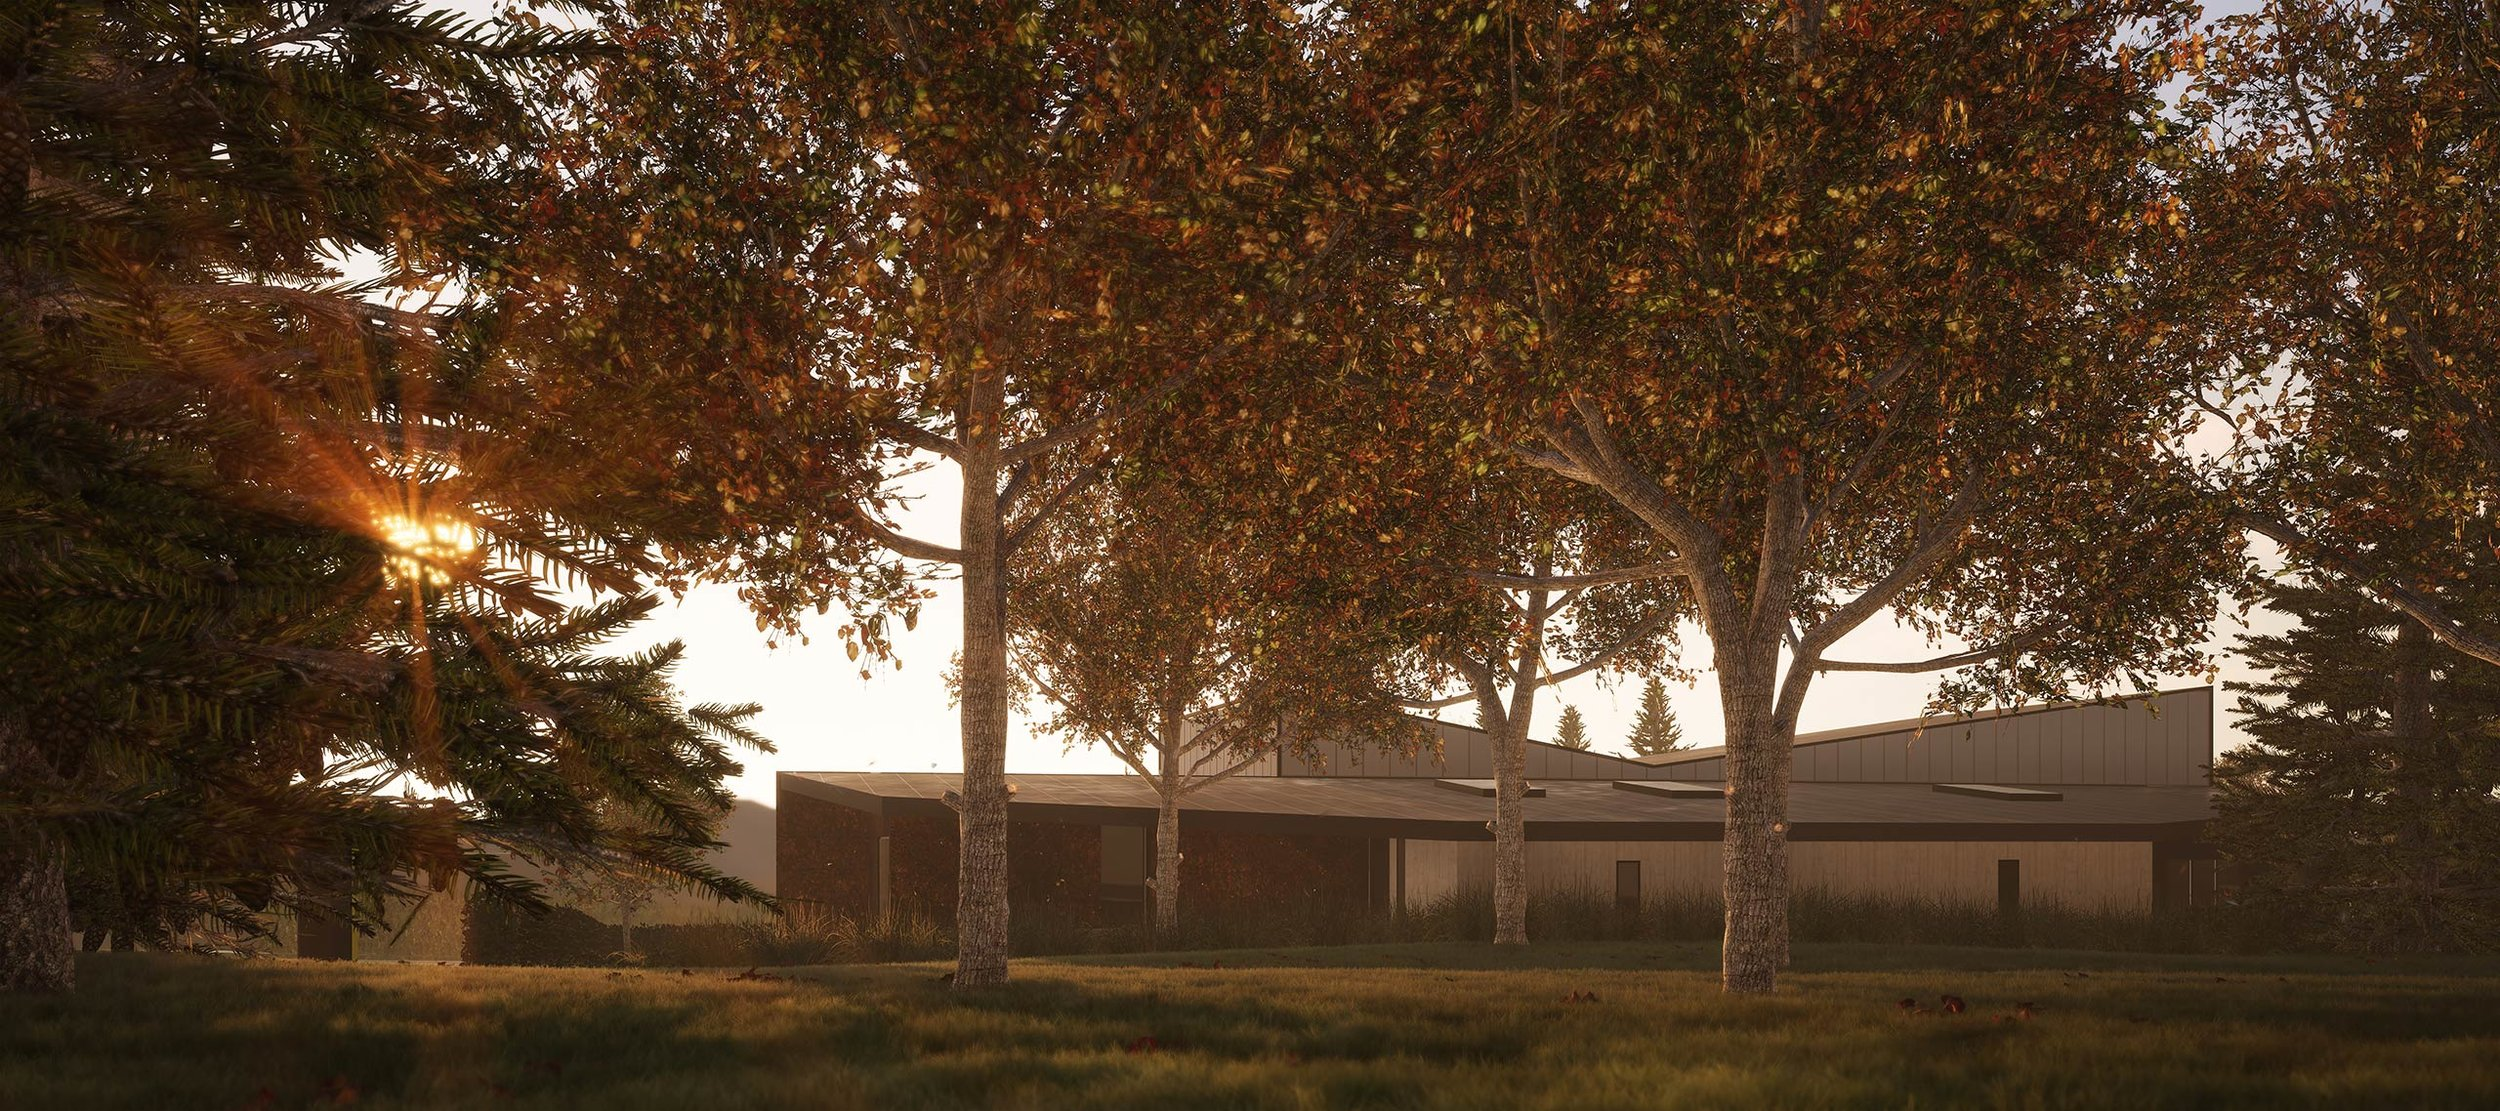 AW-Architects_St-John_Oamaru_Park-View.jpg